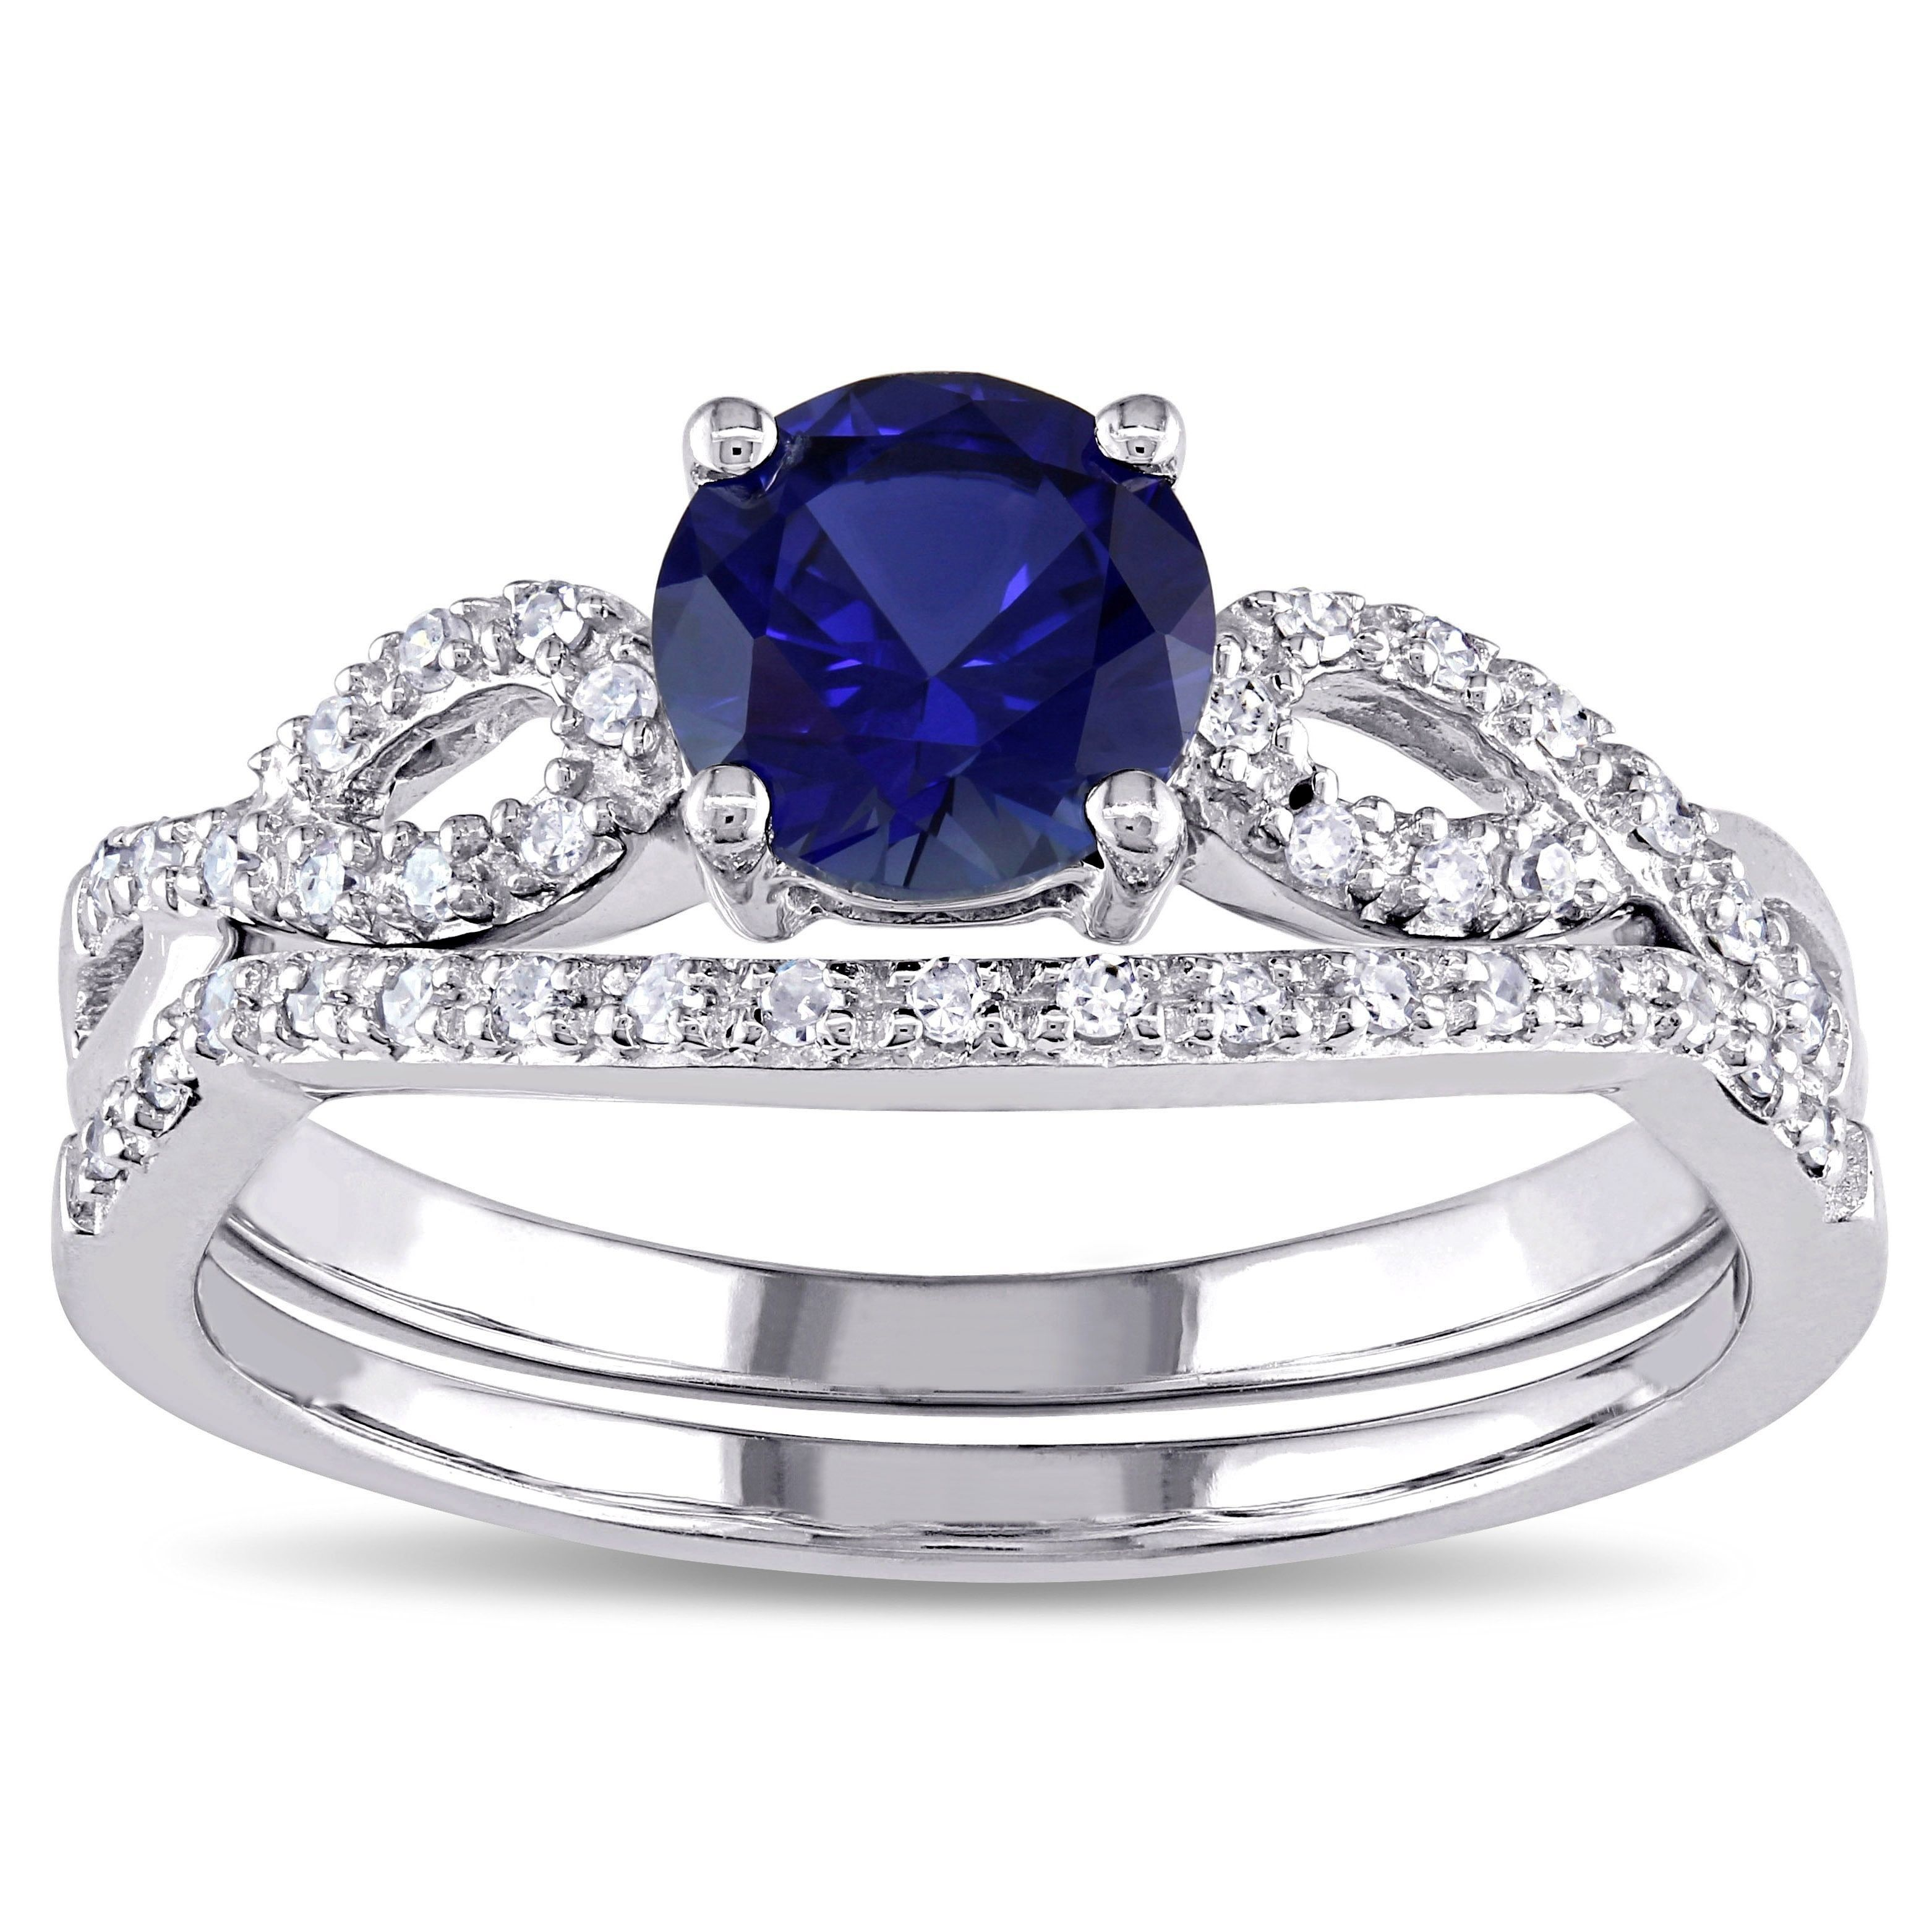 Miadora 10k White Gold Created Blue Sapphire and 16ct TDW Diamond